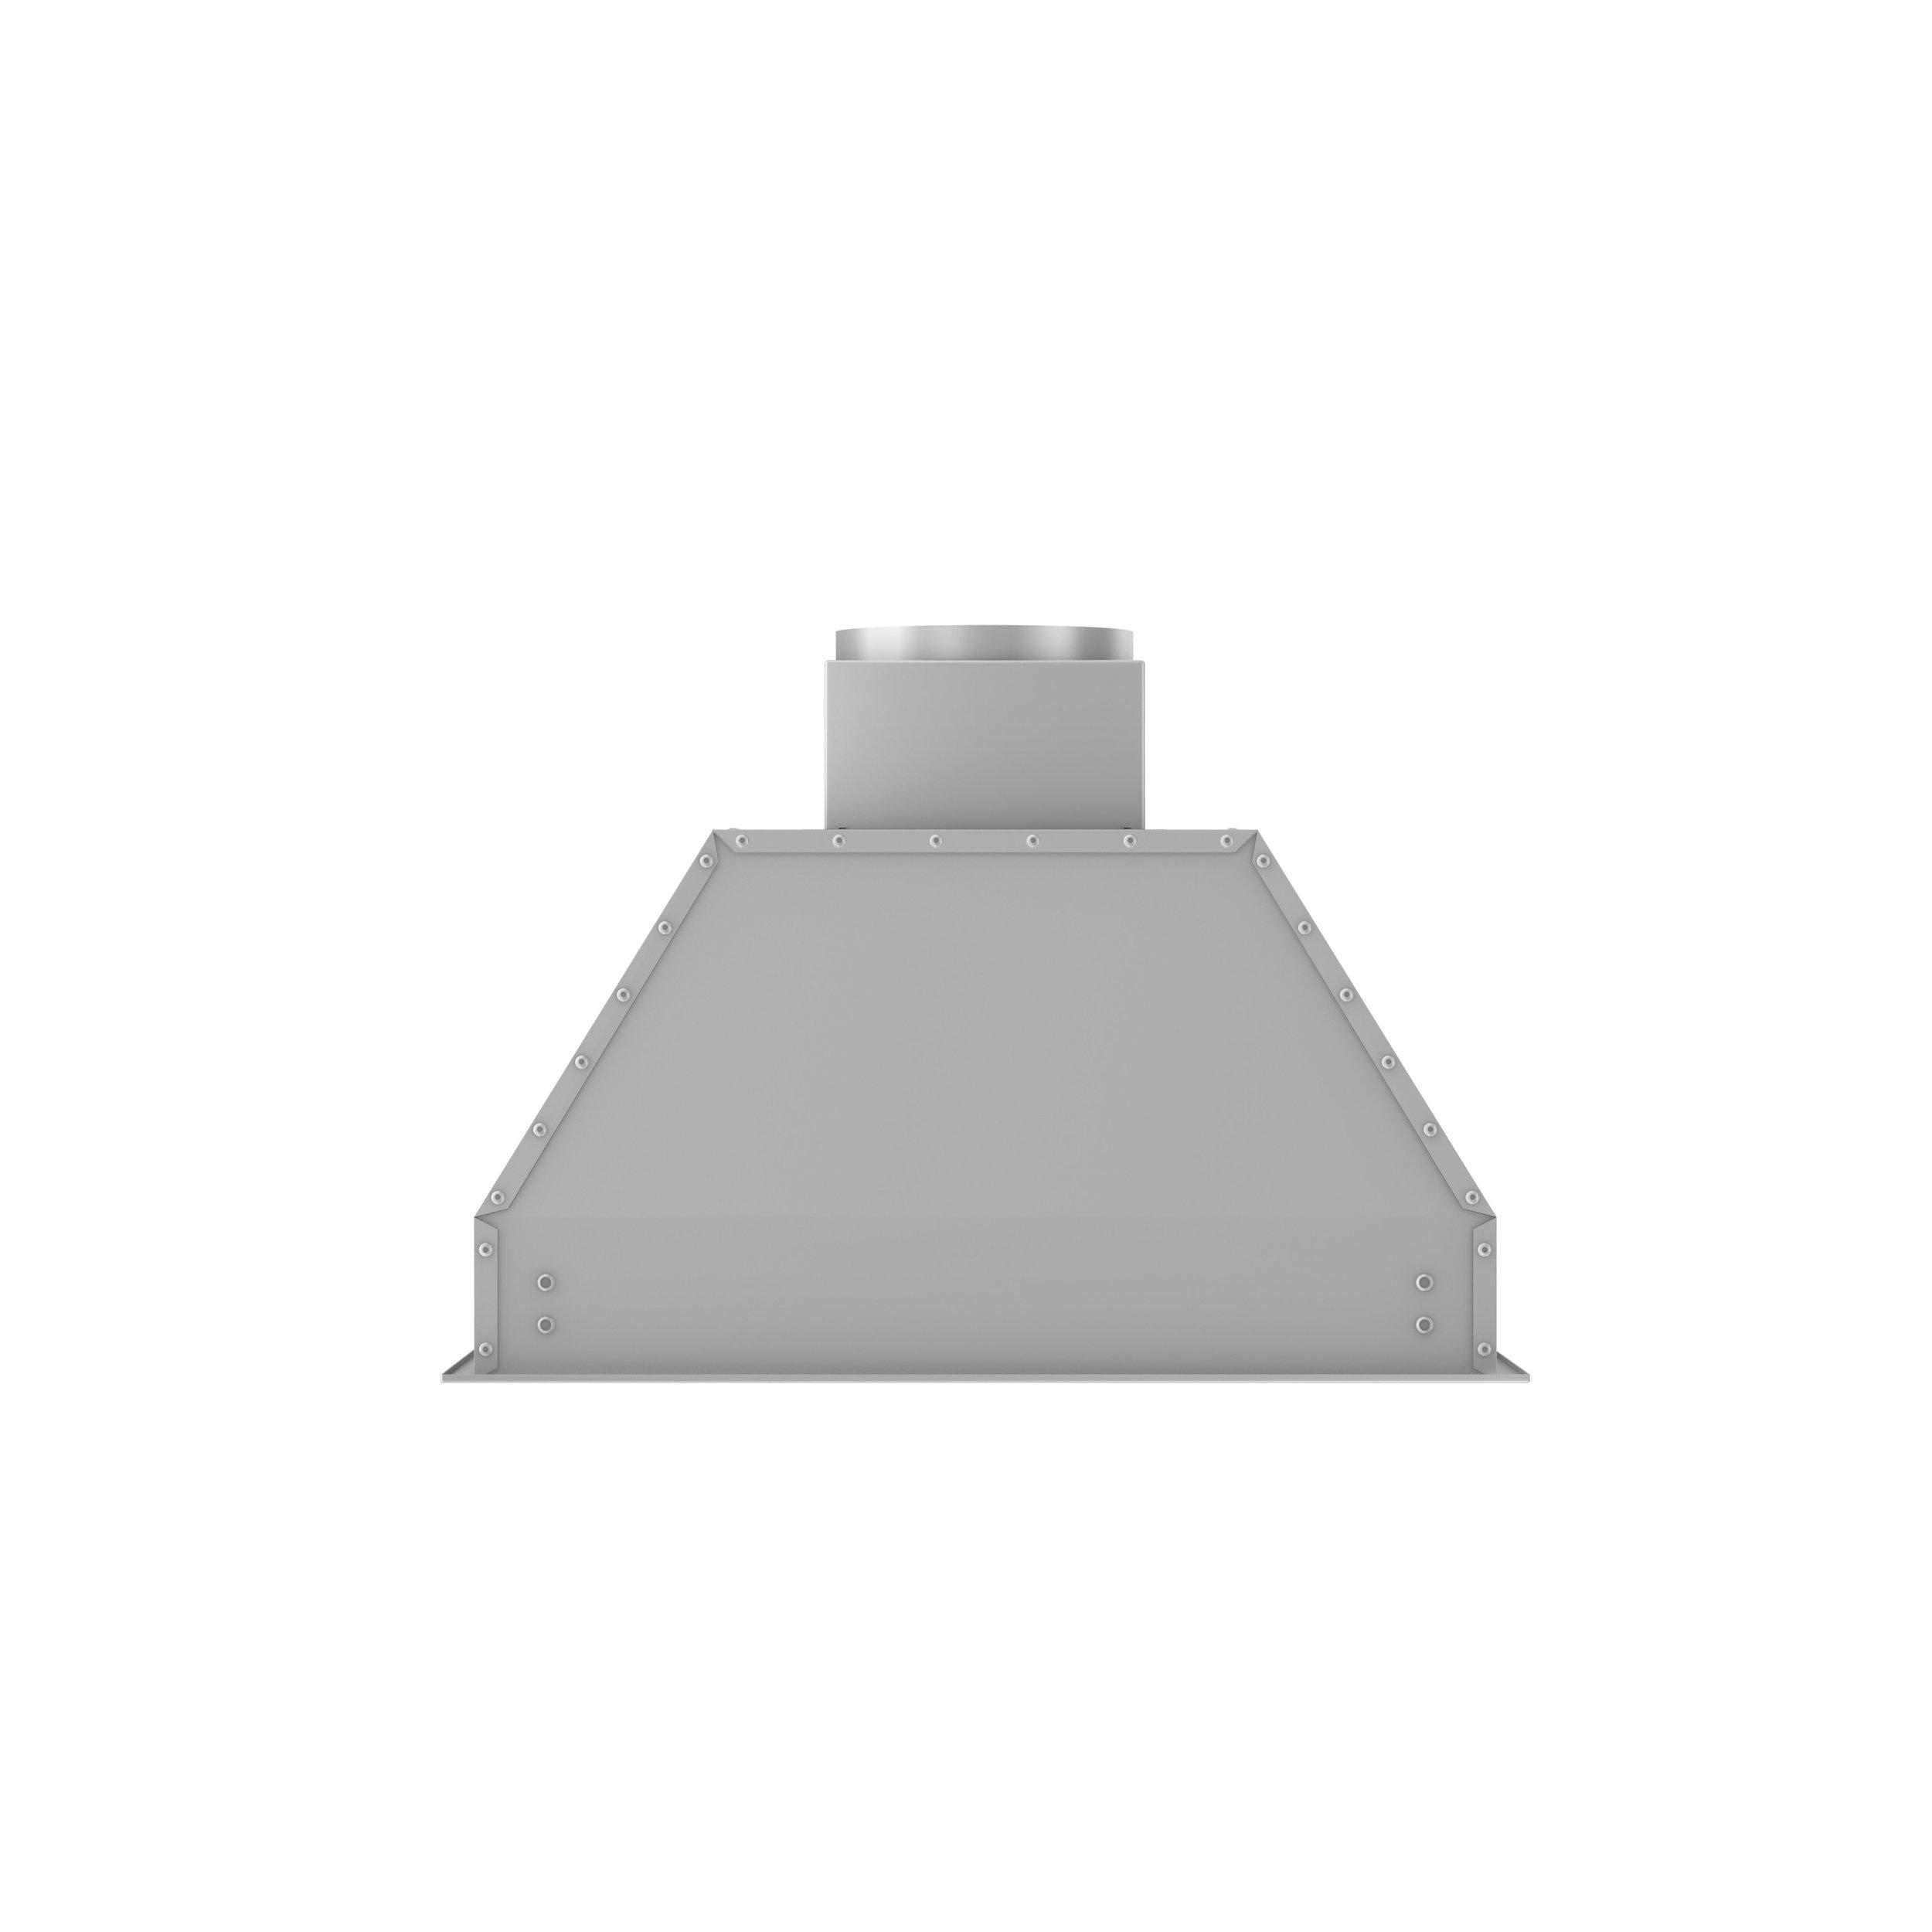 zline-stainless-steel-range-insert-698_40-front.jpeg